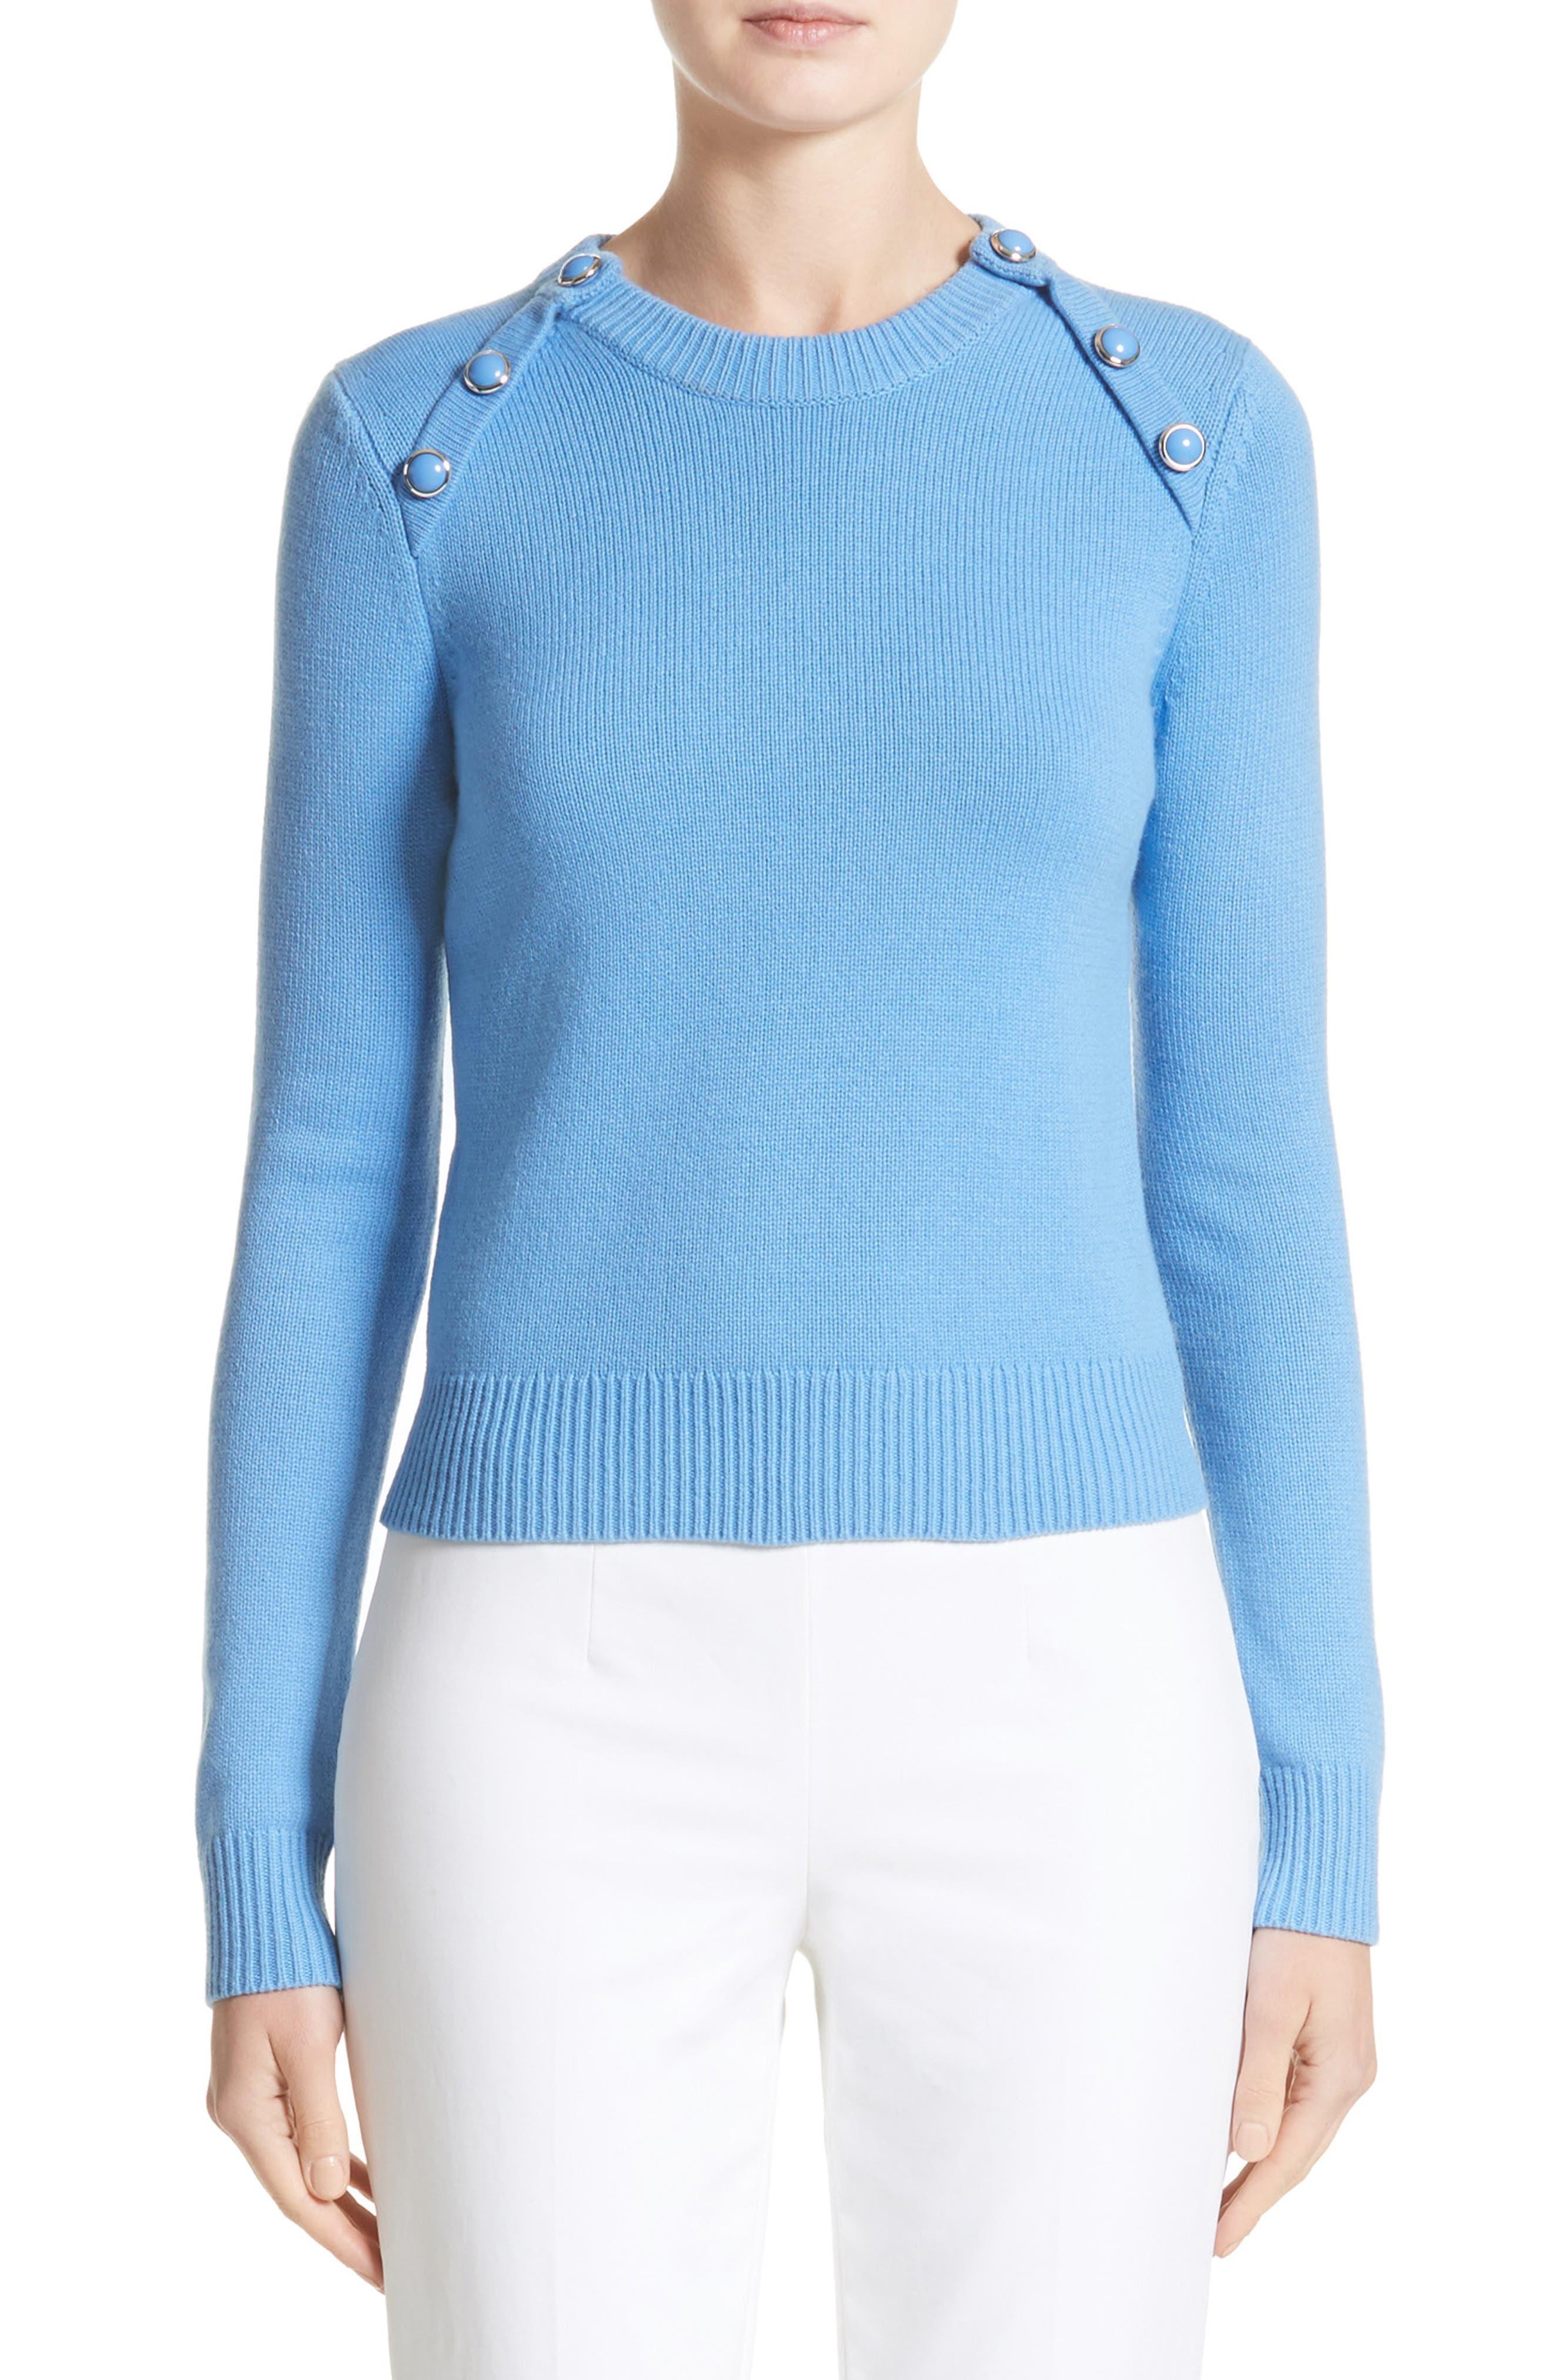 Raglan Cashmere Sweater,                         Main,                         color, Cadet